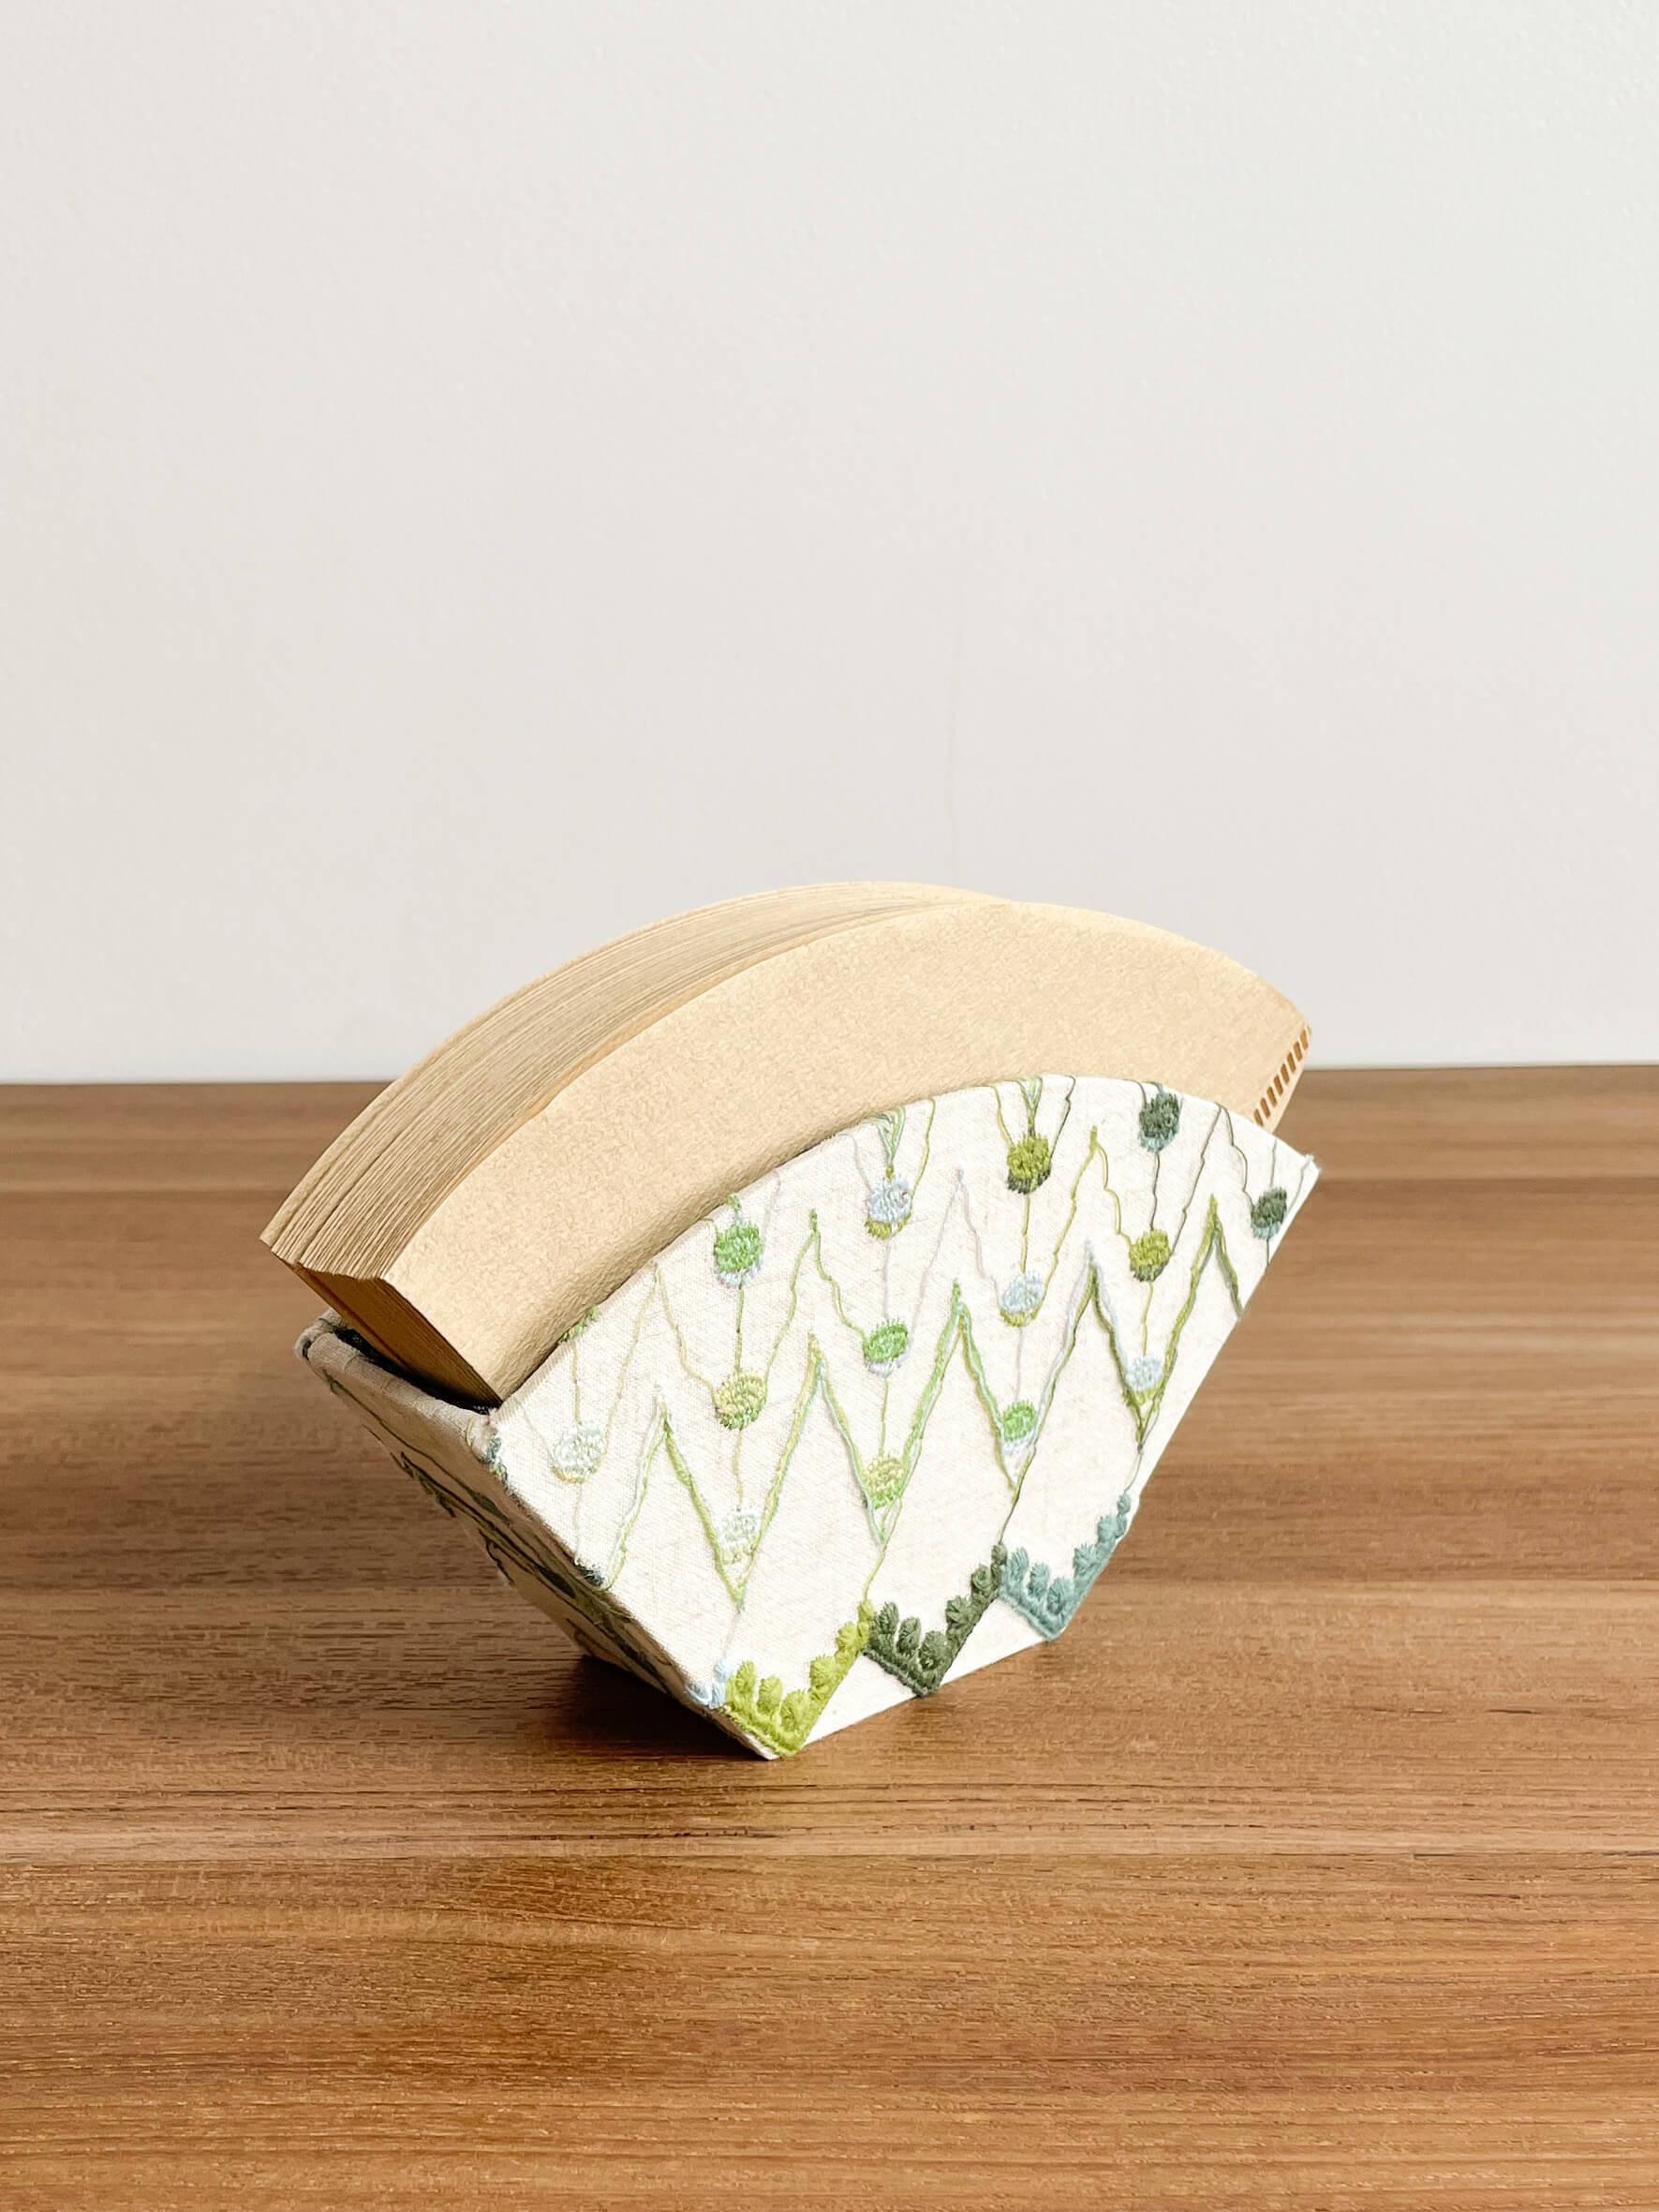 hacocco cartonnage coffee drip filter case